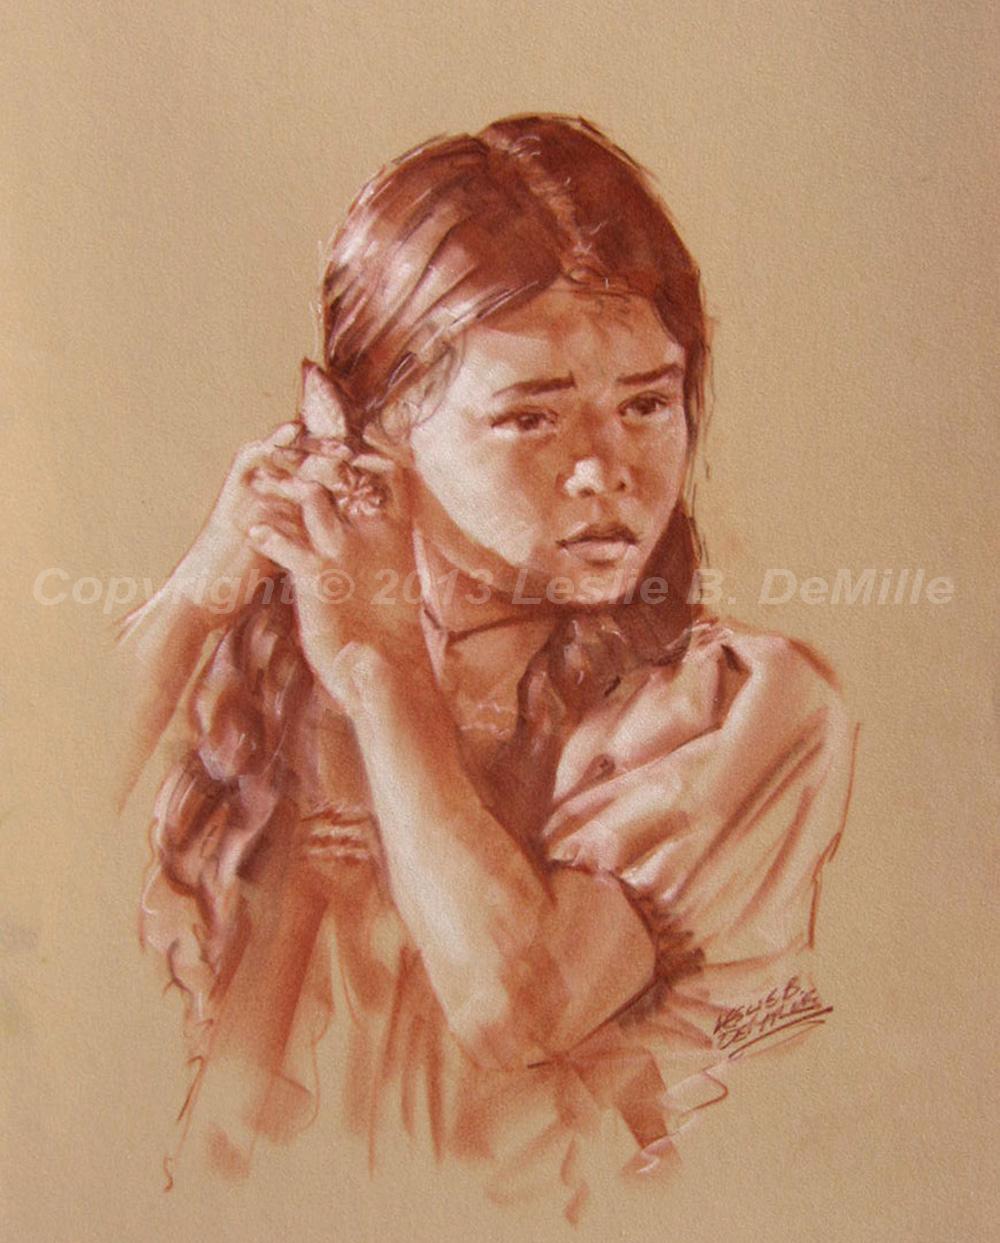 Hair Ties, Sepia (11x14)